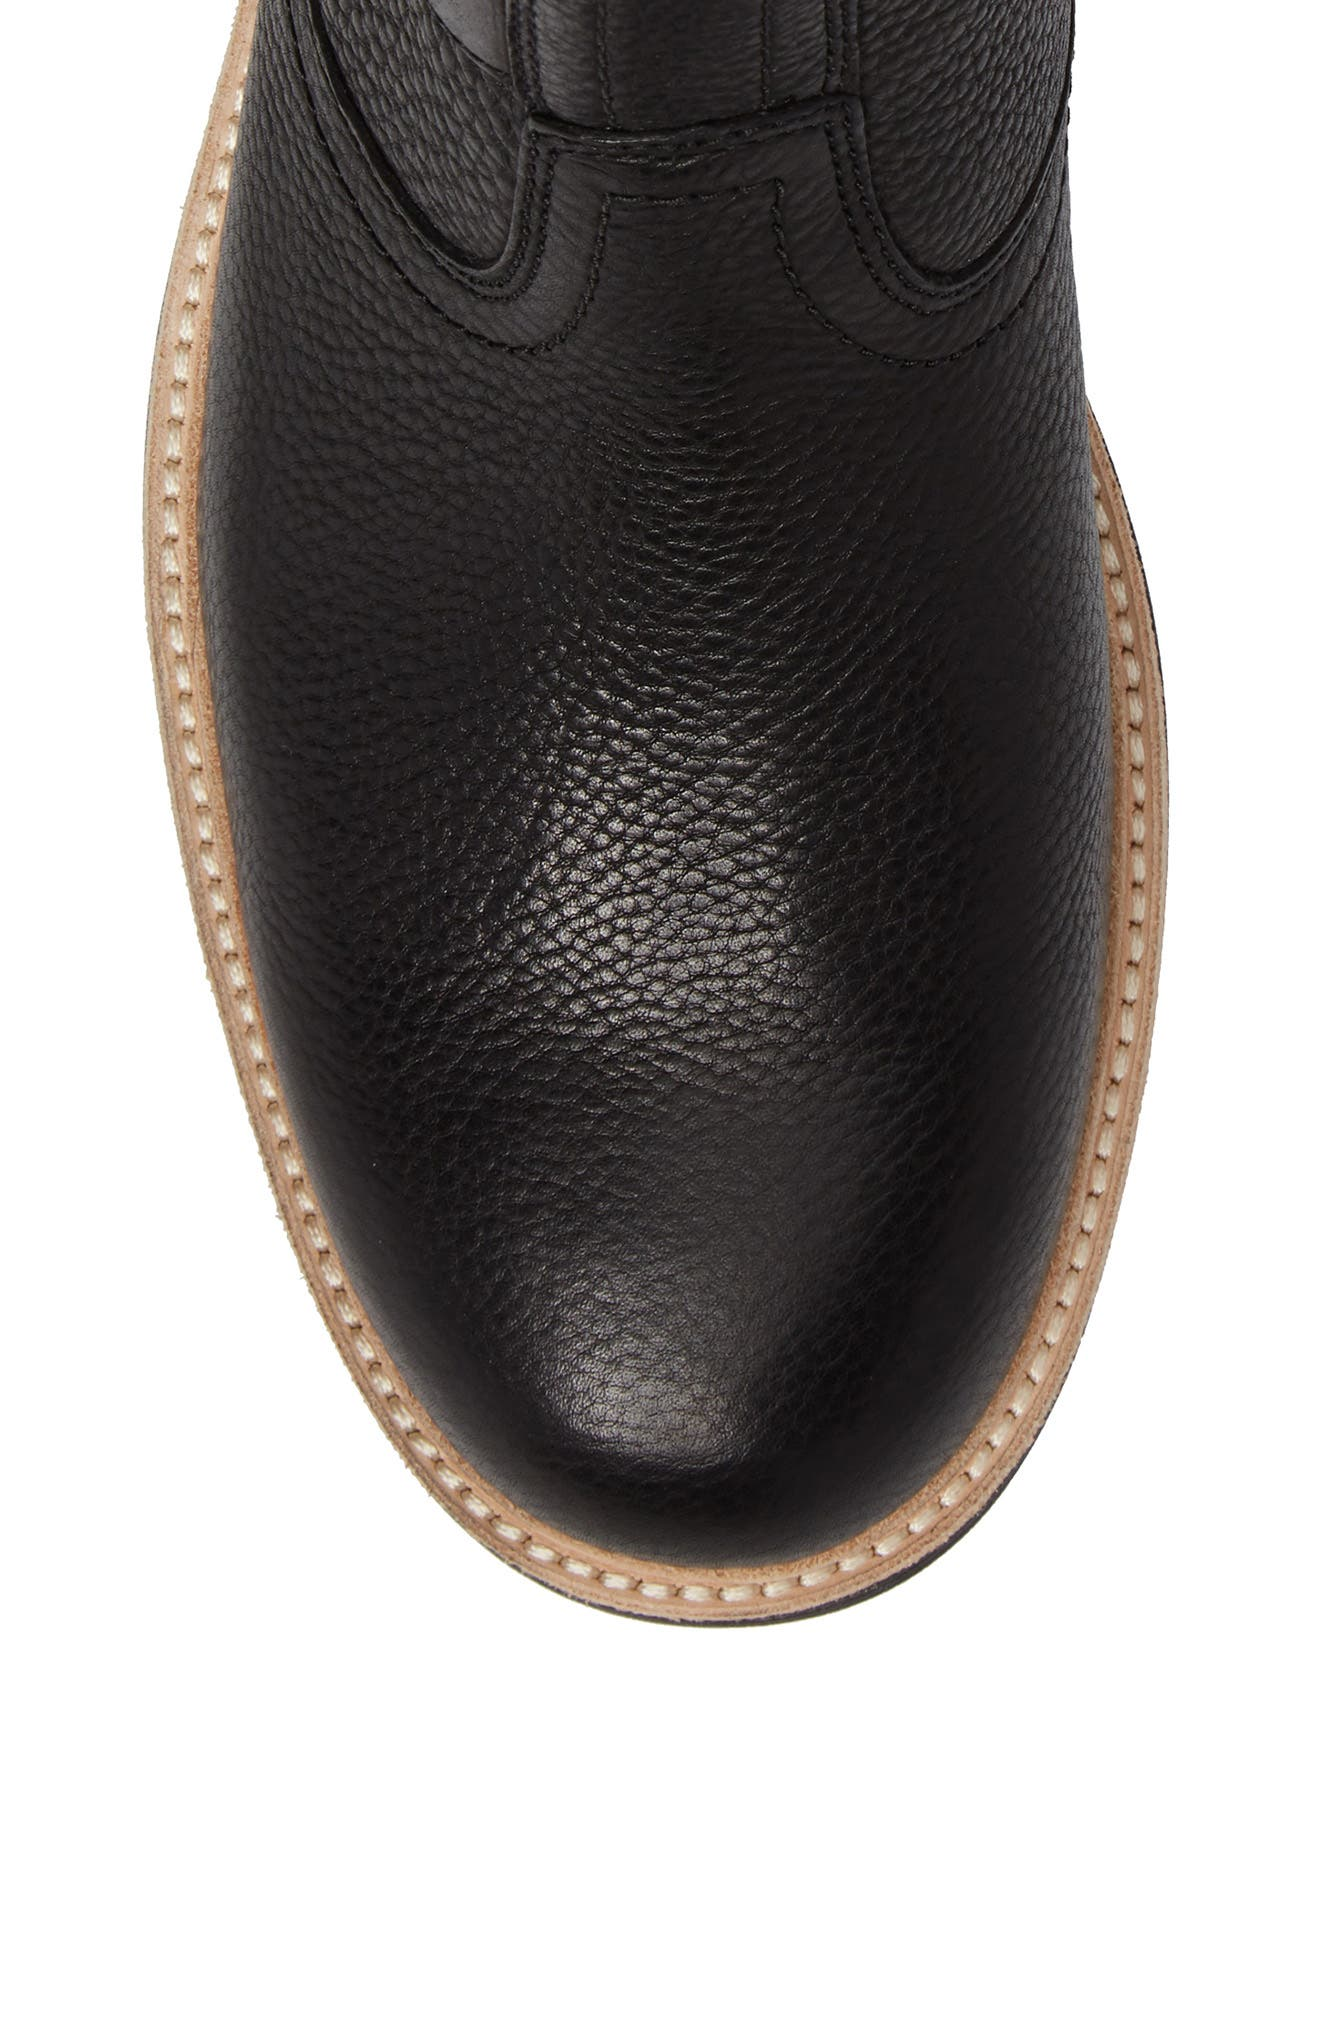 Jaren Zip Boot with Genuine Shearling,                             Alternate thumbnail 5, color,                             Black